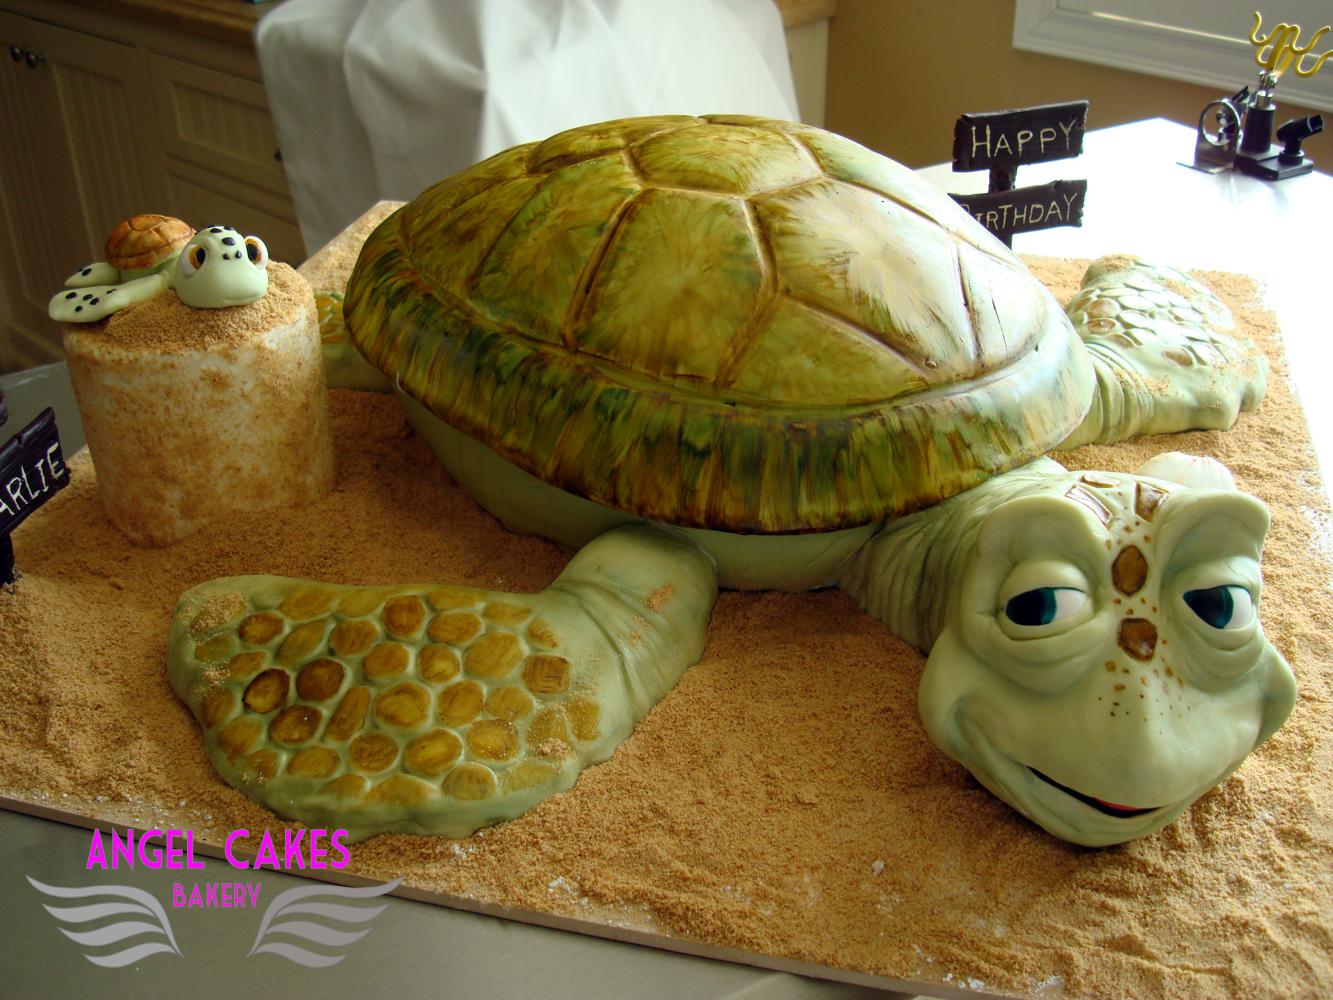 Angel Cakes Bakery Sea Turtle Cake Finding Nemo